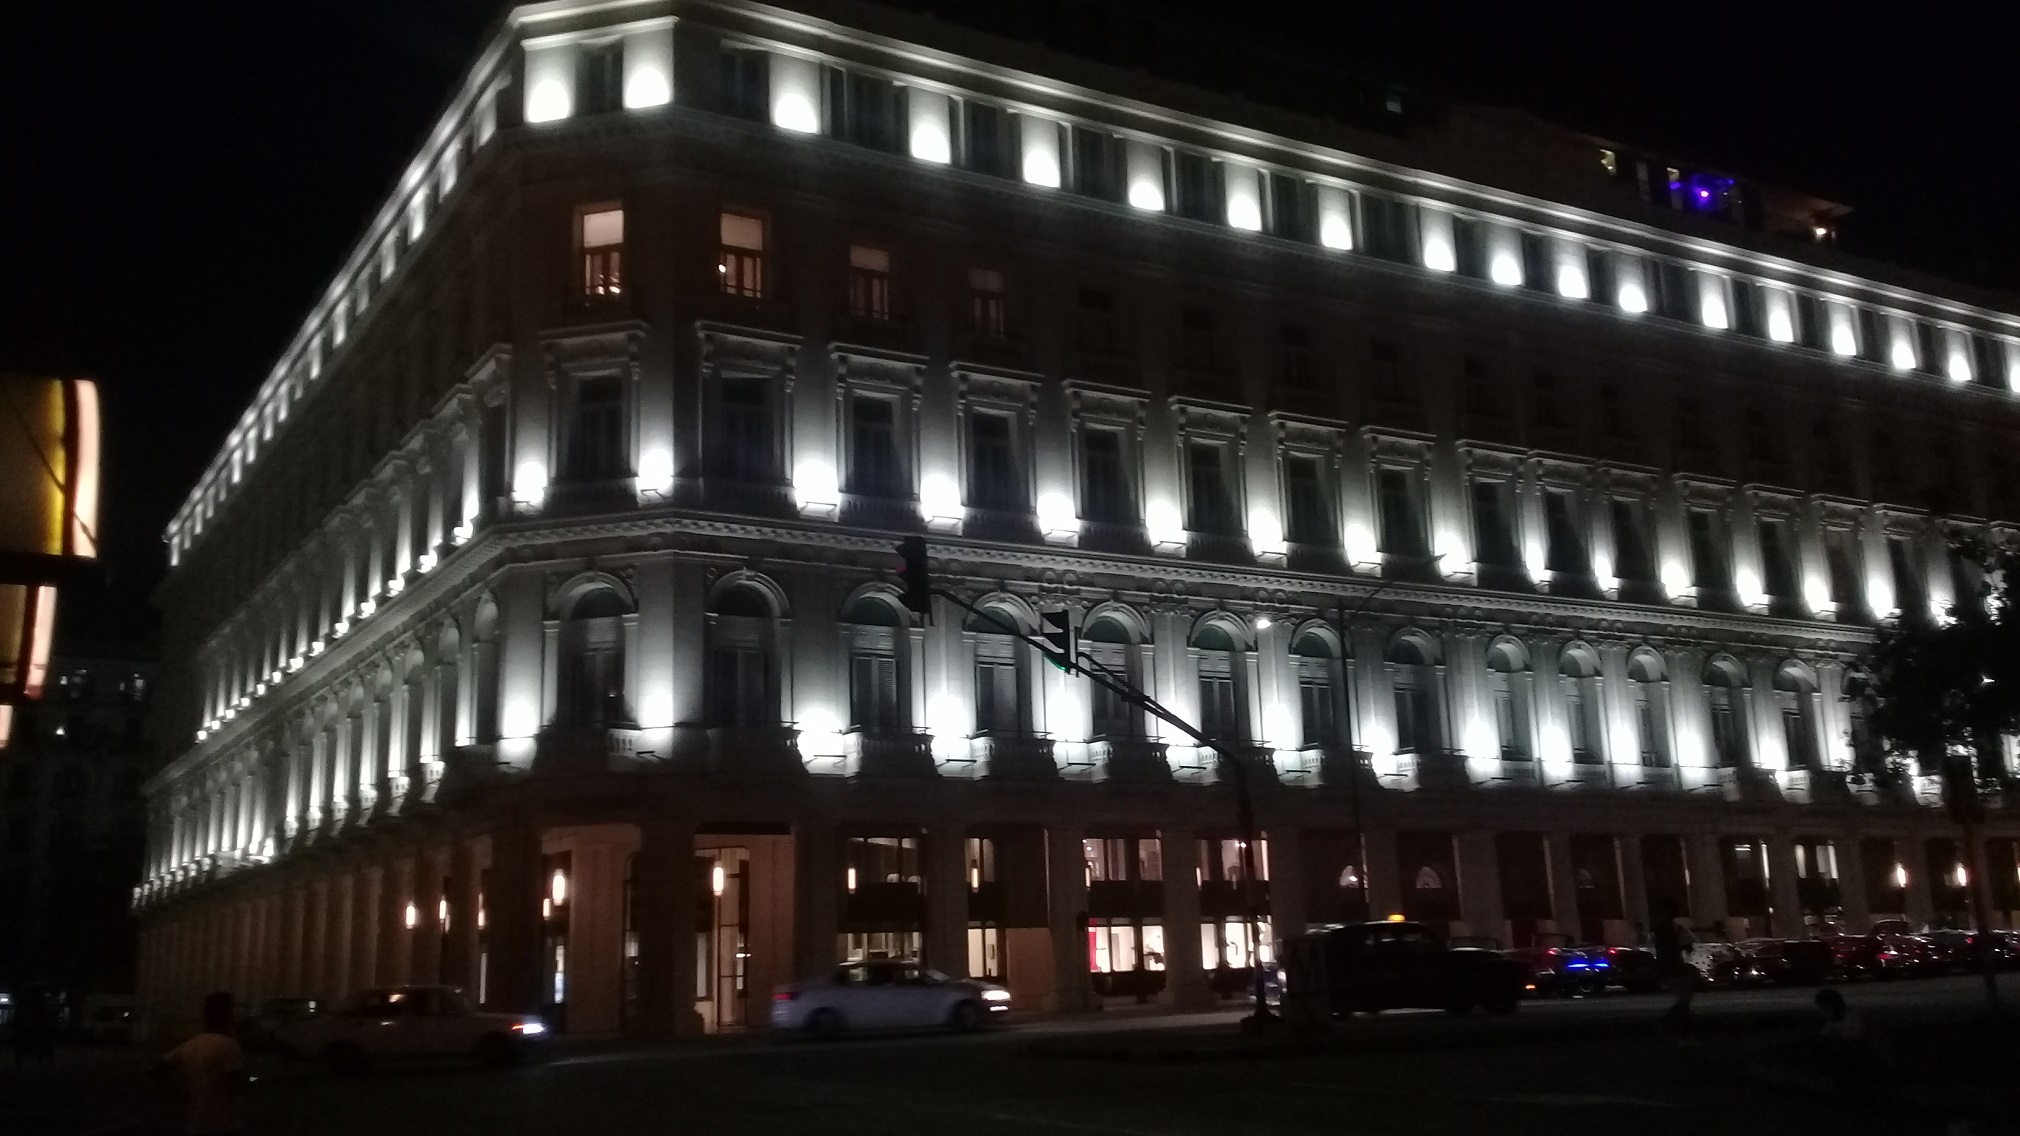 Lighting system Cuba